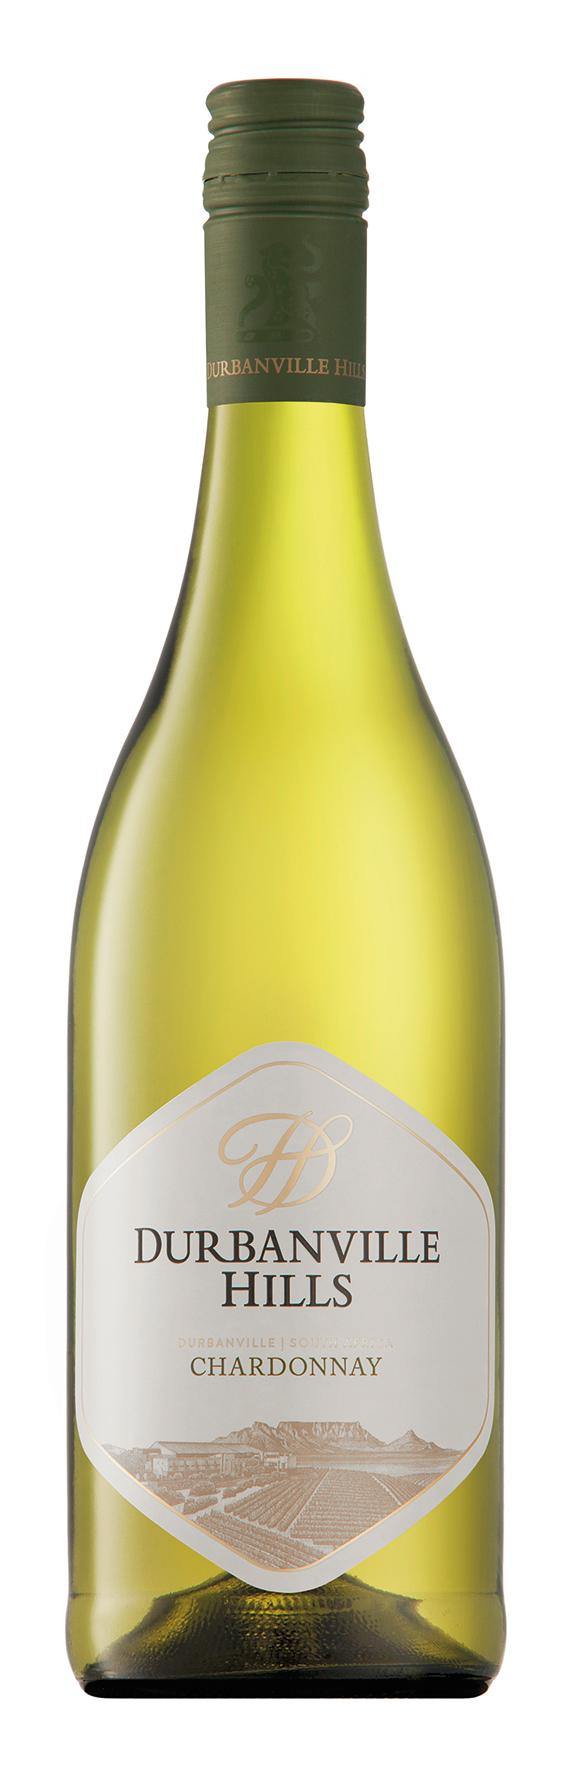 2015 Chardonnay DURBANVILLE HILLS